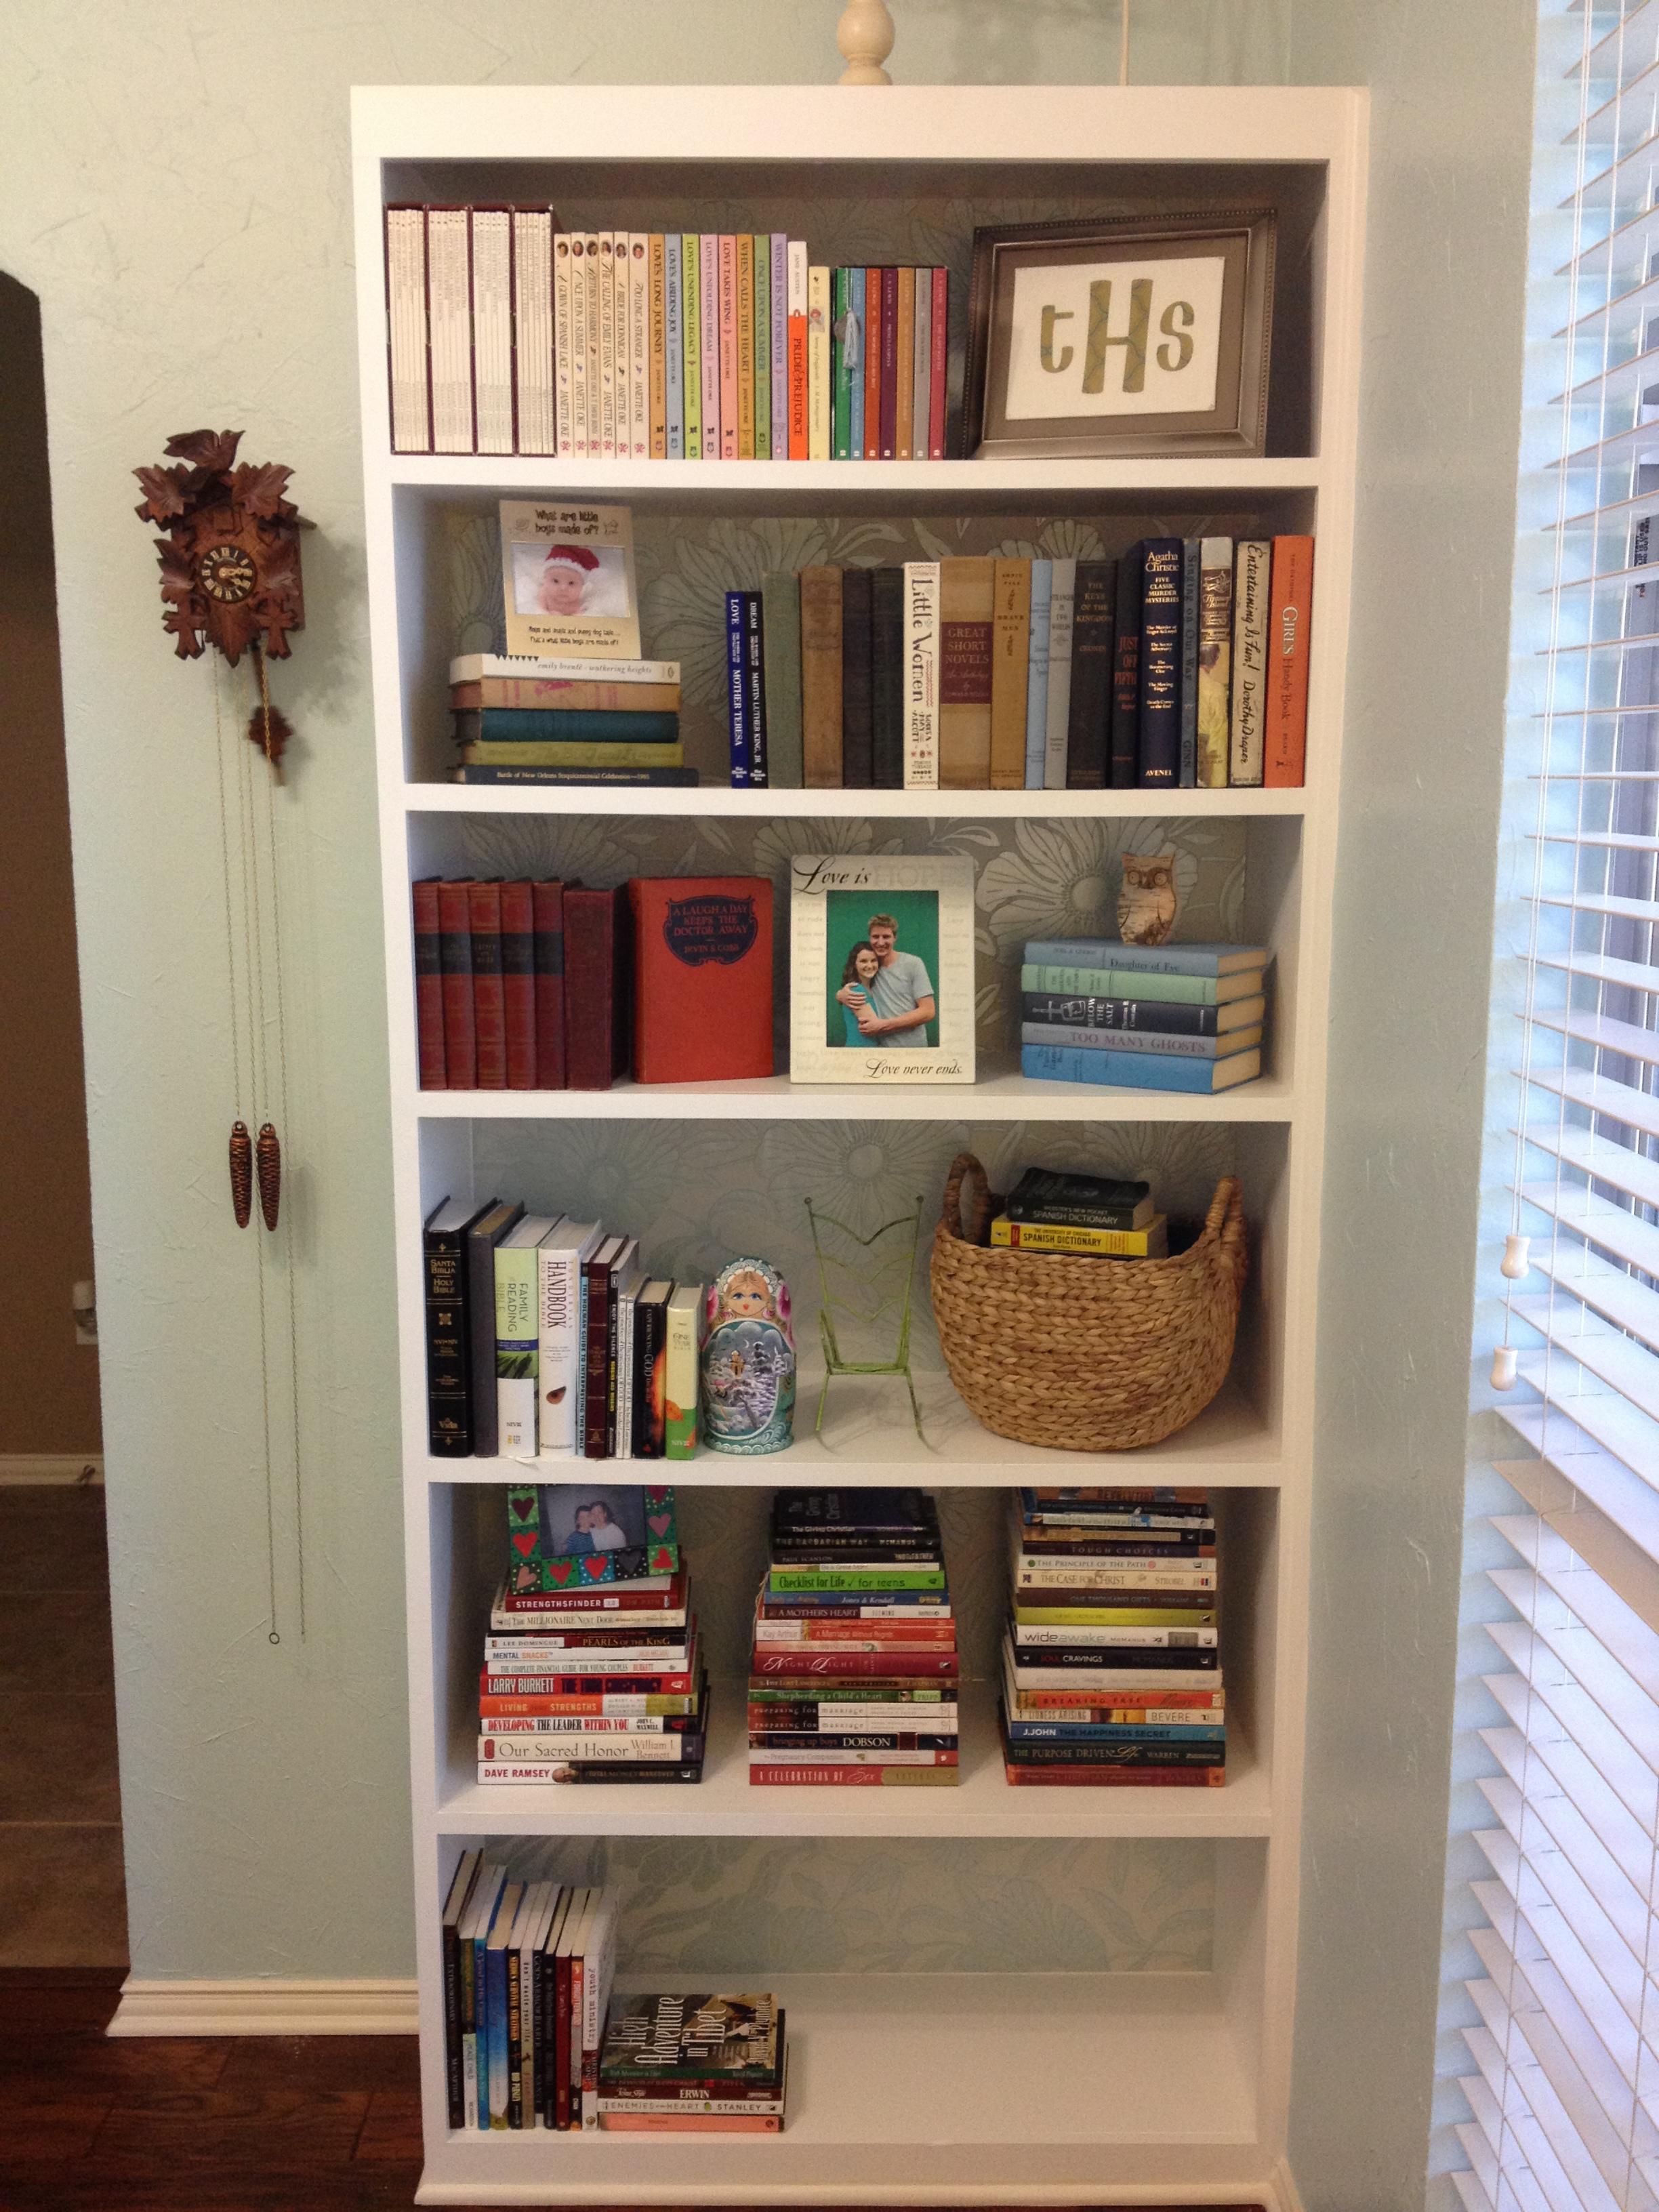 Semi-completed bookcase arrangement.